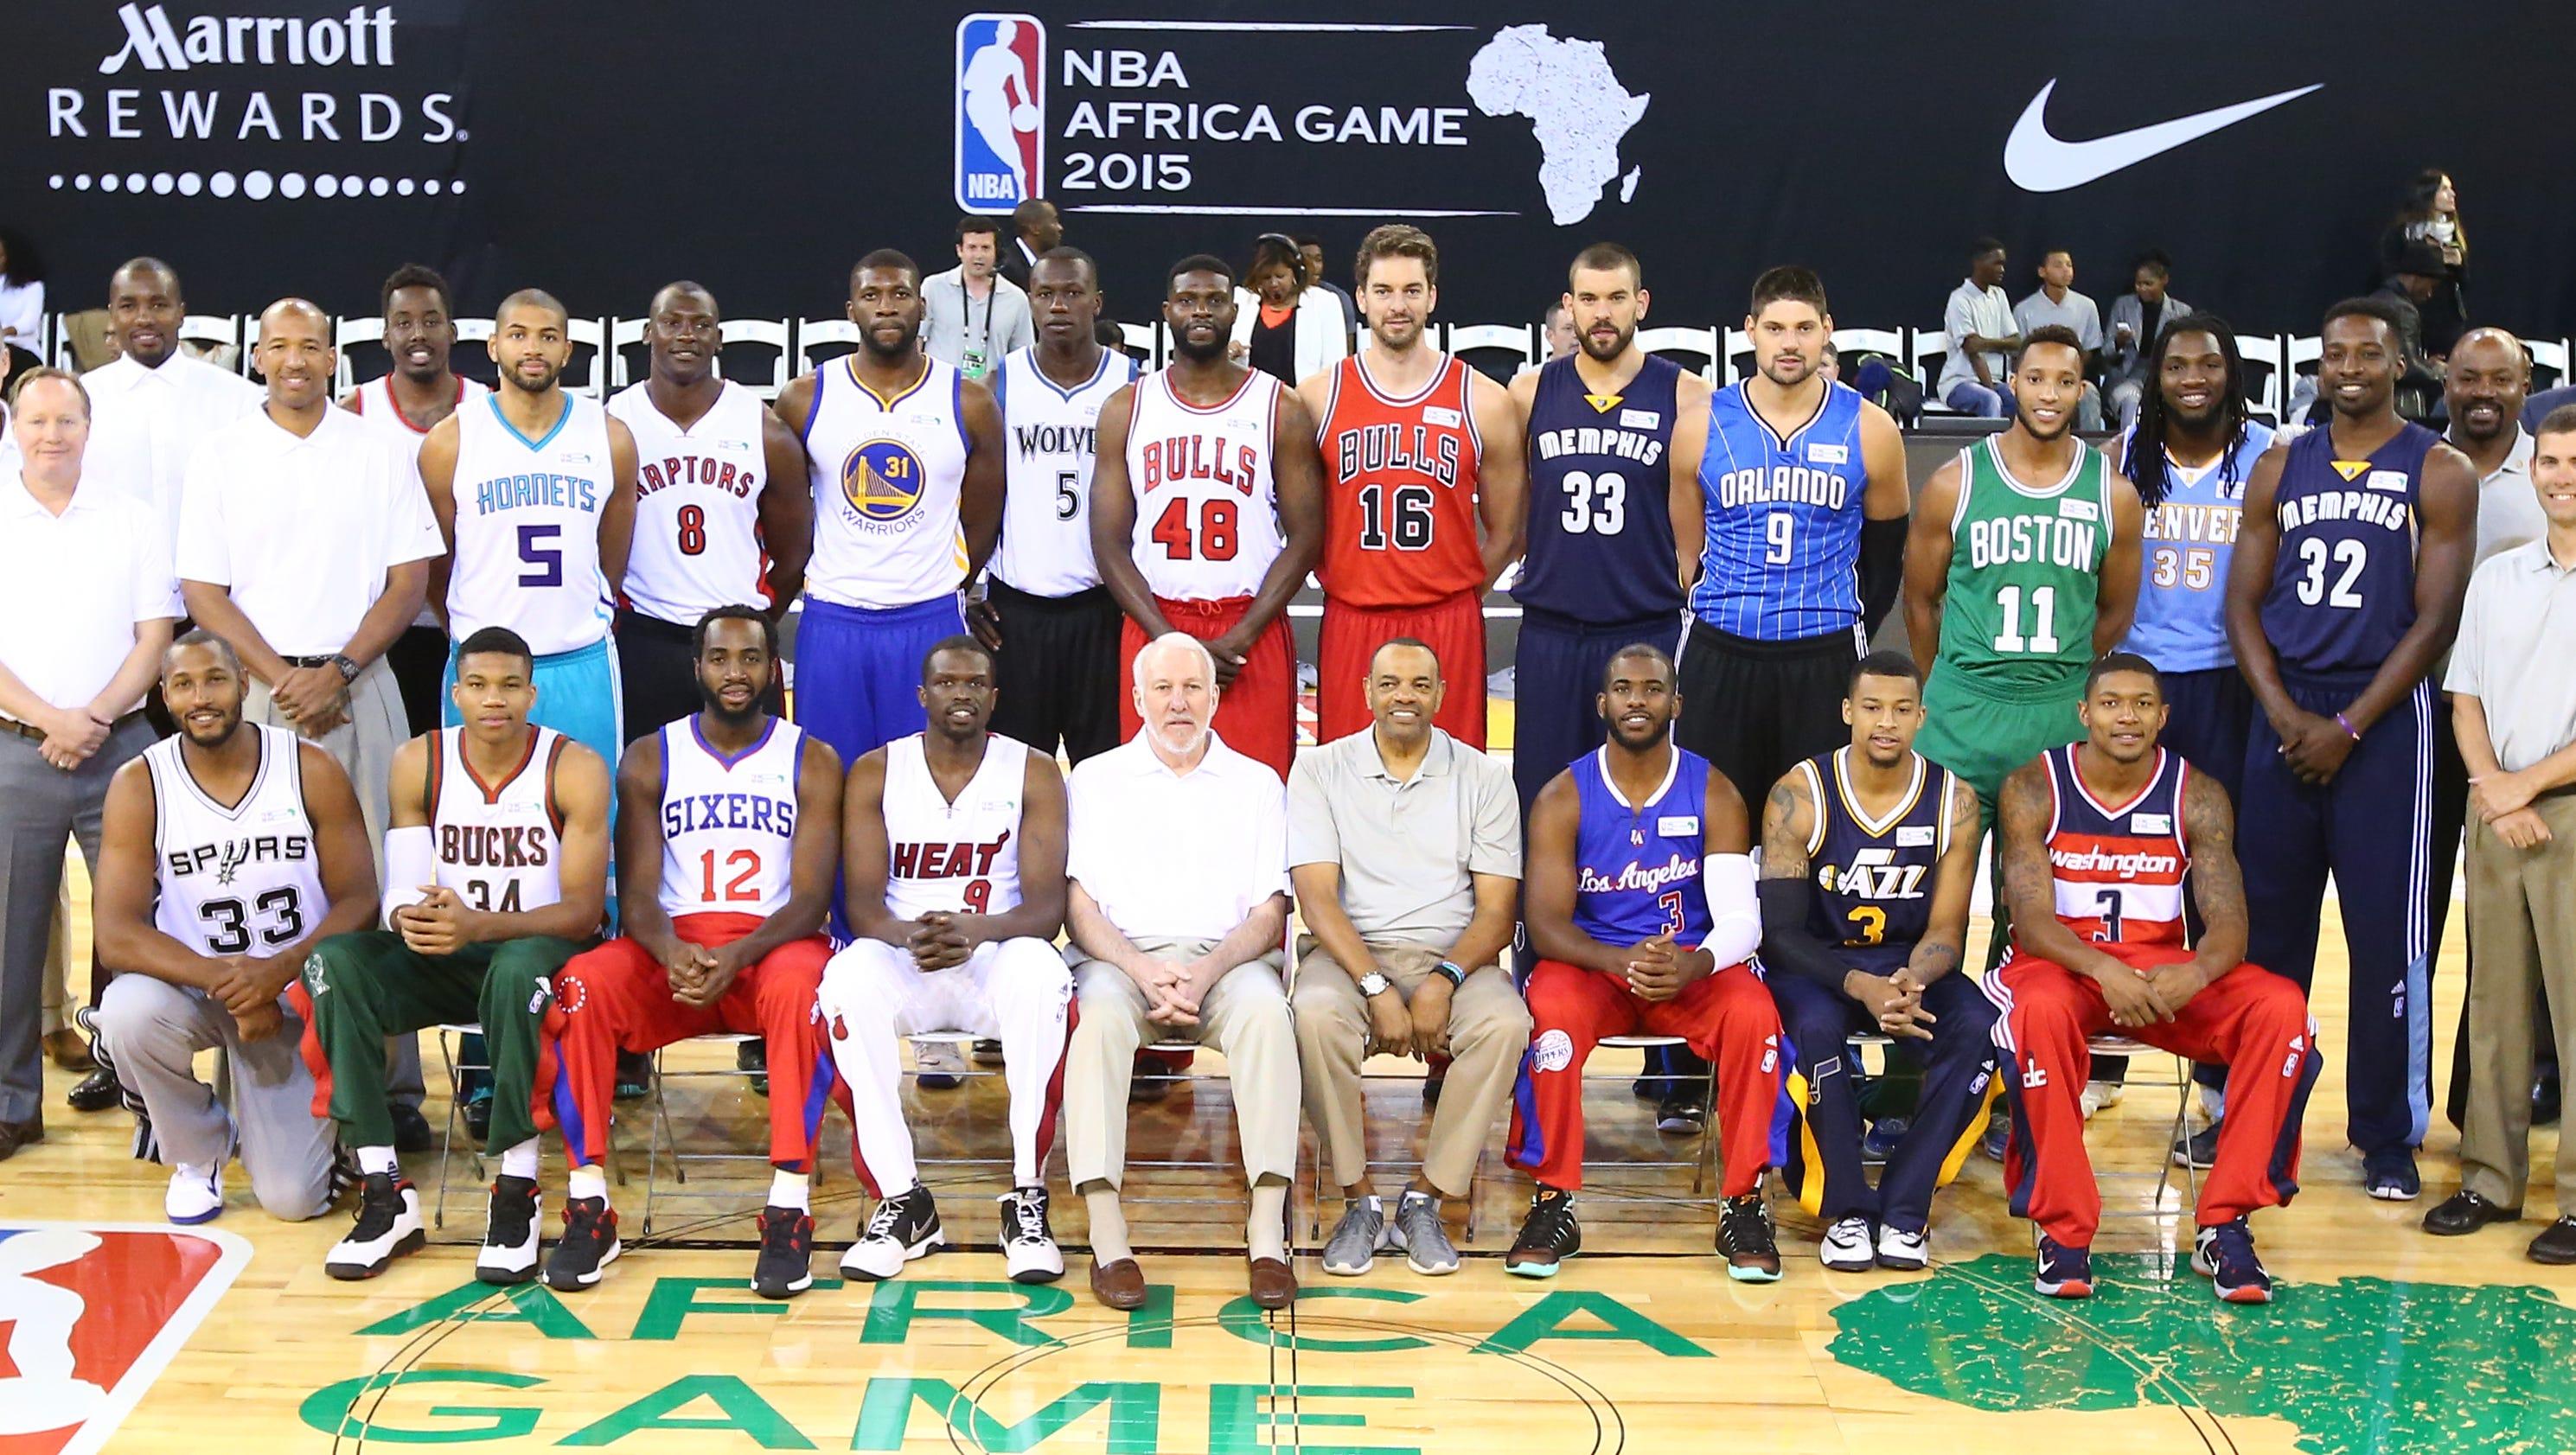 C.J. McCollum, Bismack Biyombo headline second NBA Africa Game